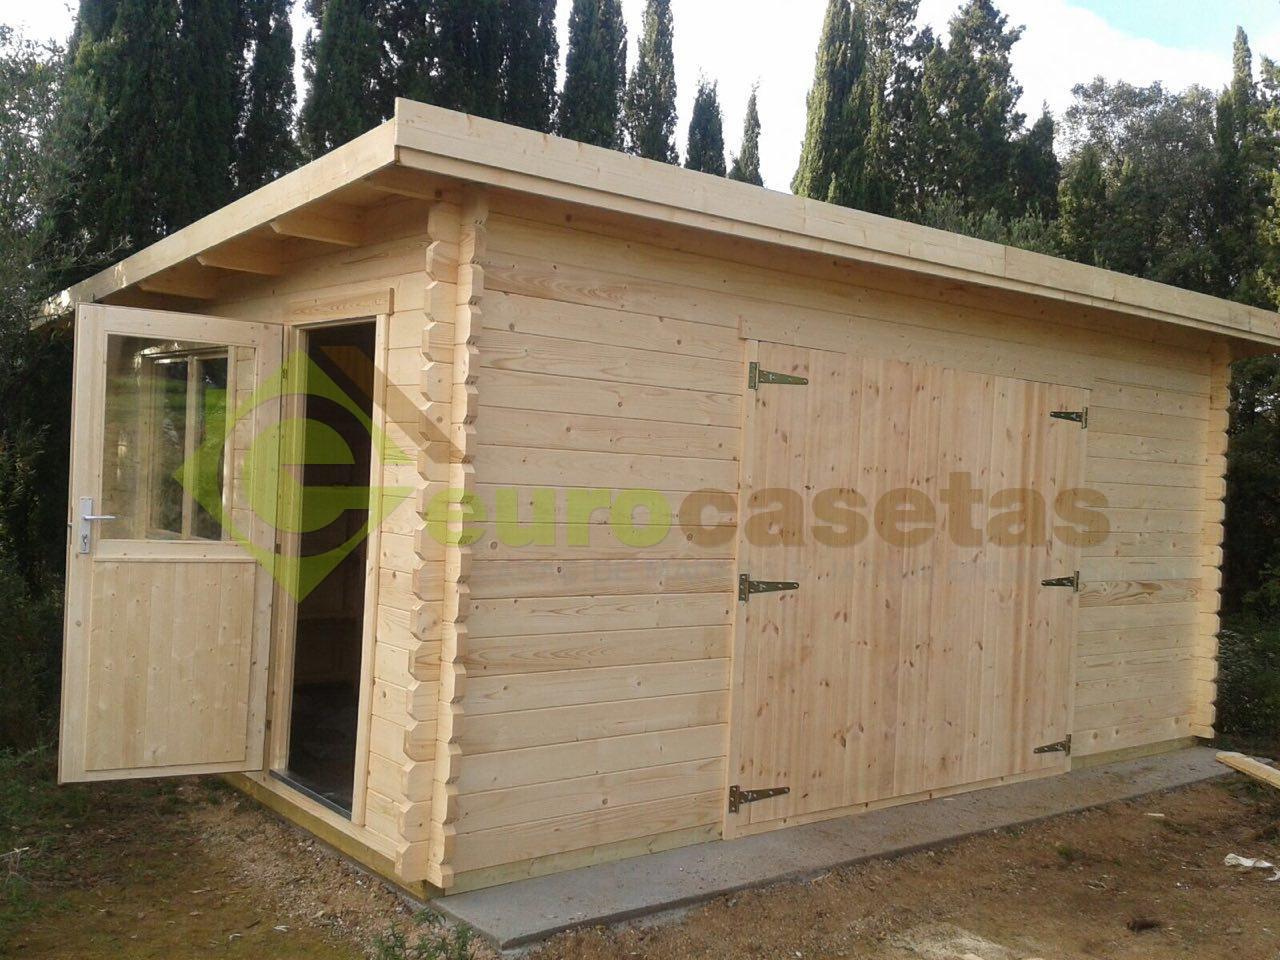 Garaje de madera modern eurocasetas casas de madera - Garaje de madera ...